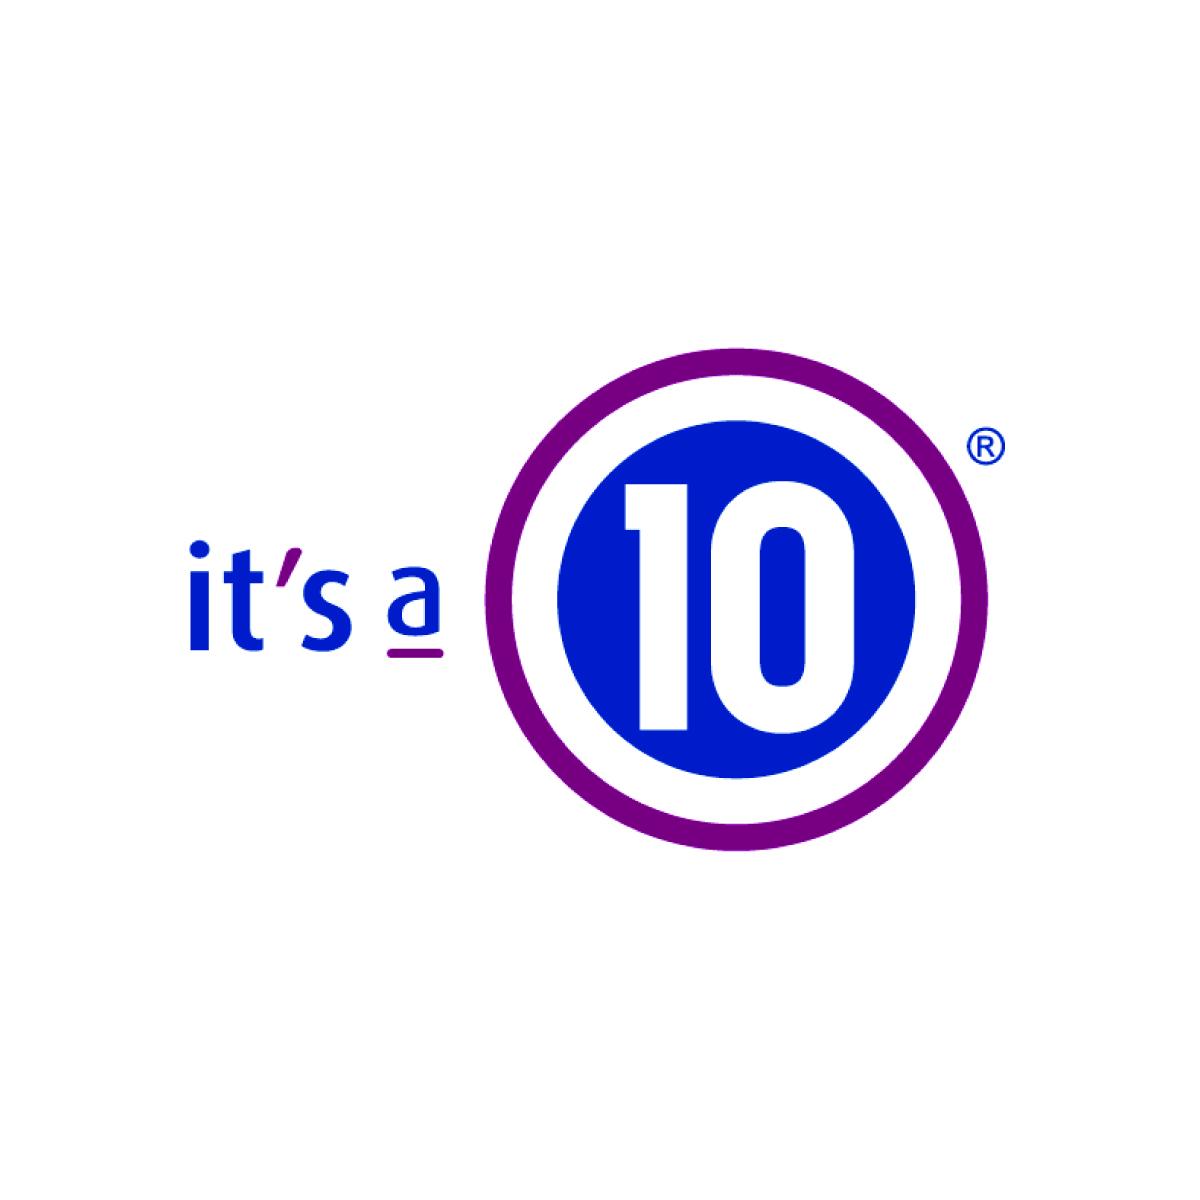 its a 10.jpg